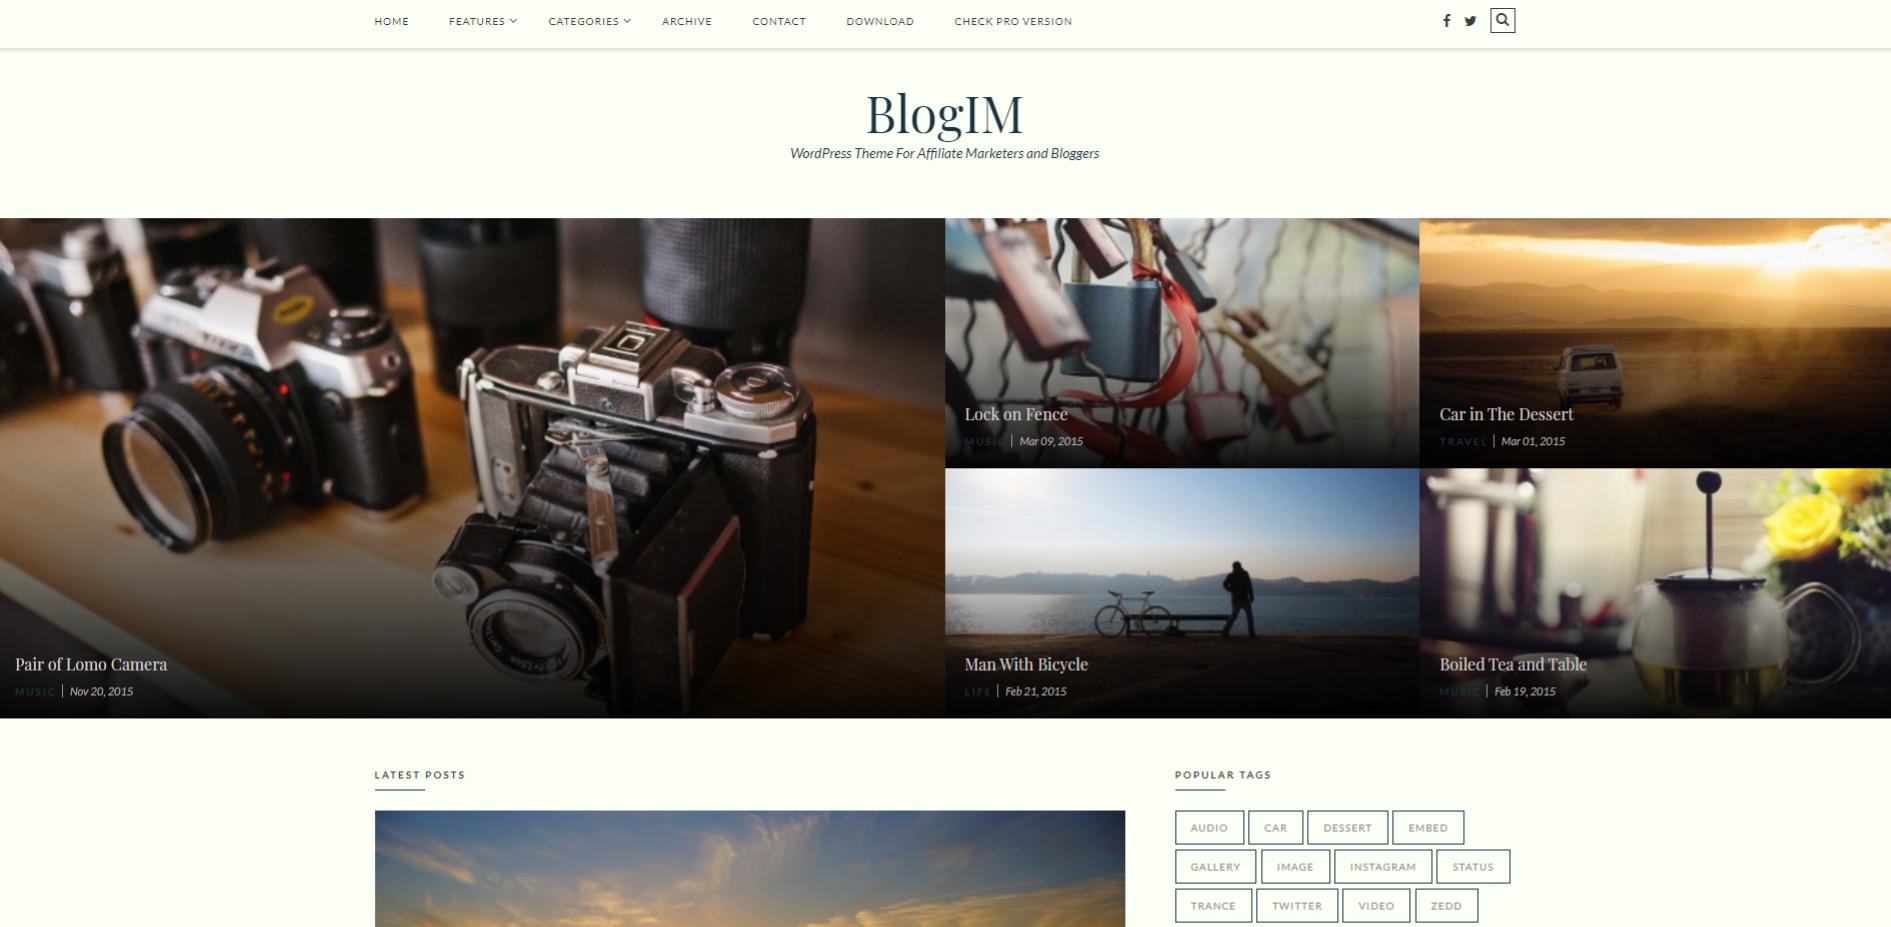 Blogim WordPress Theme